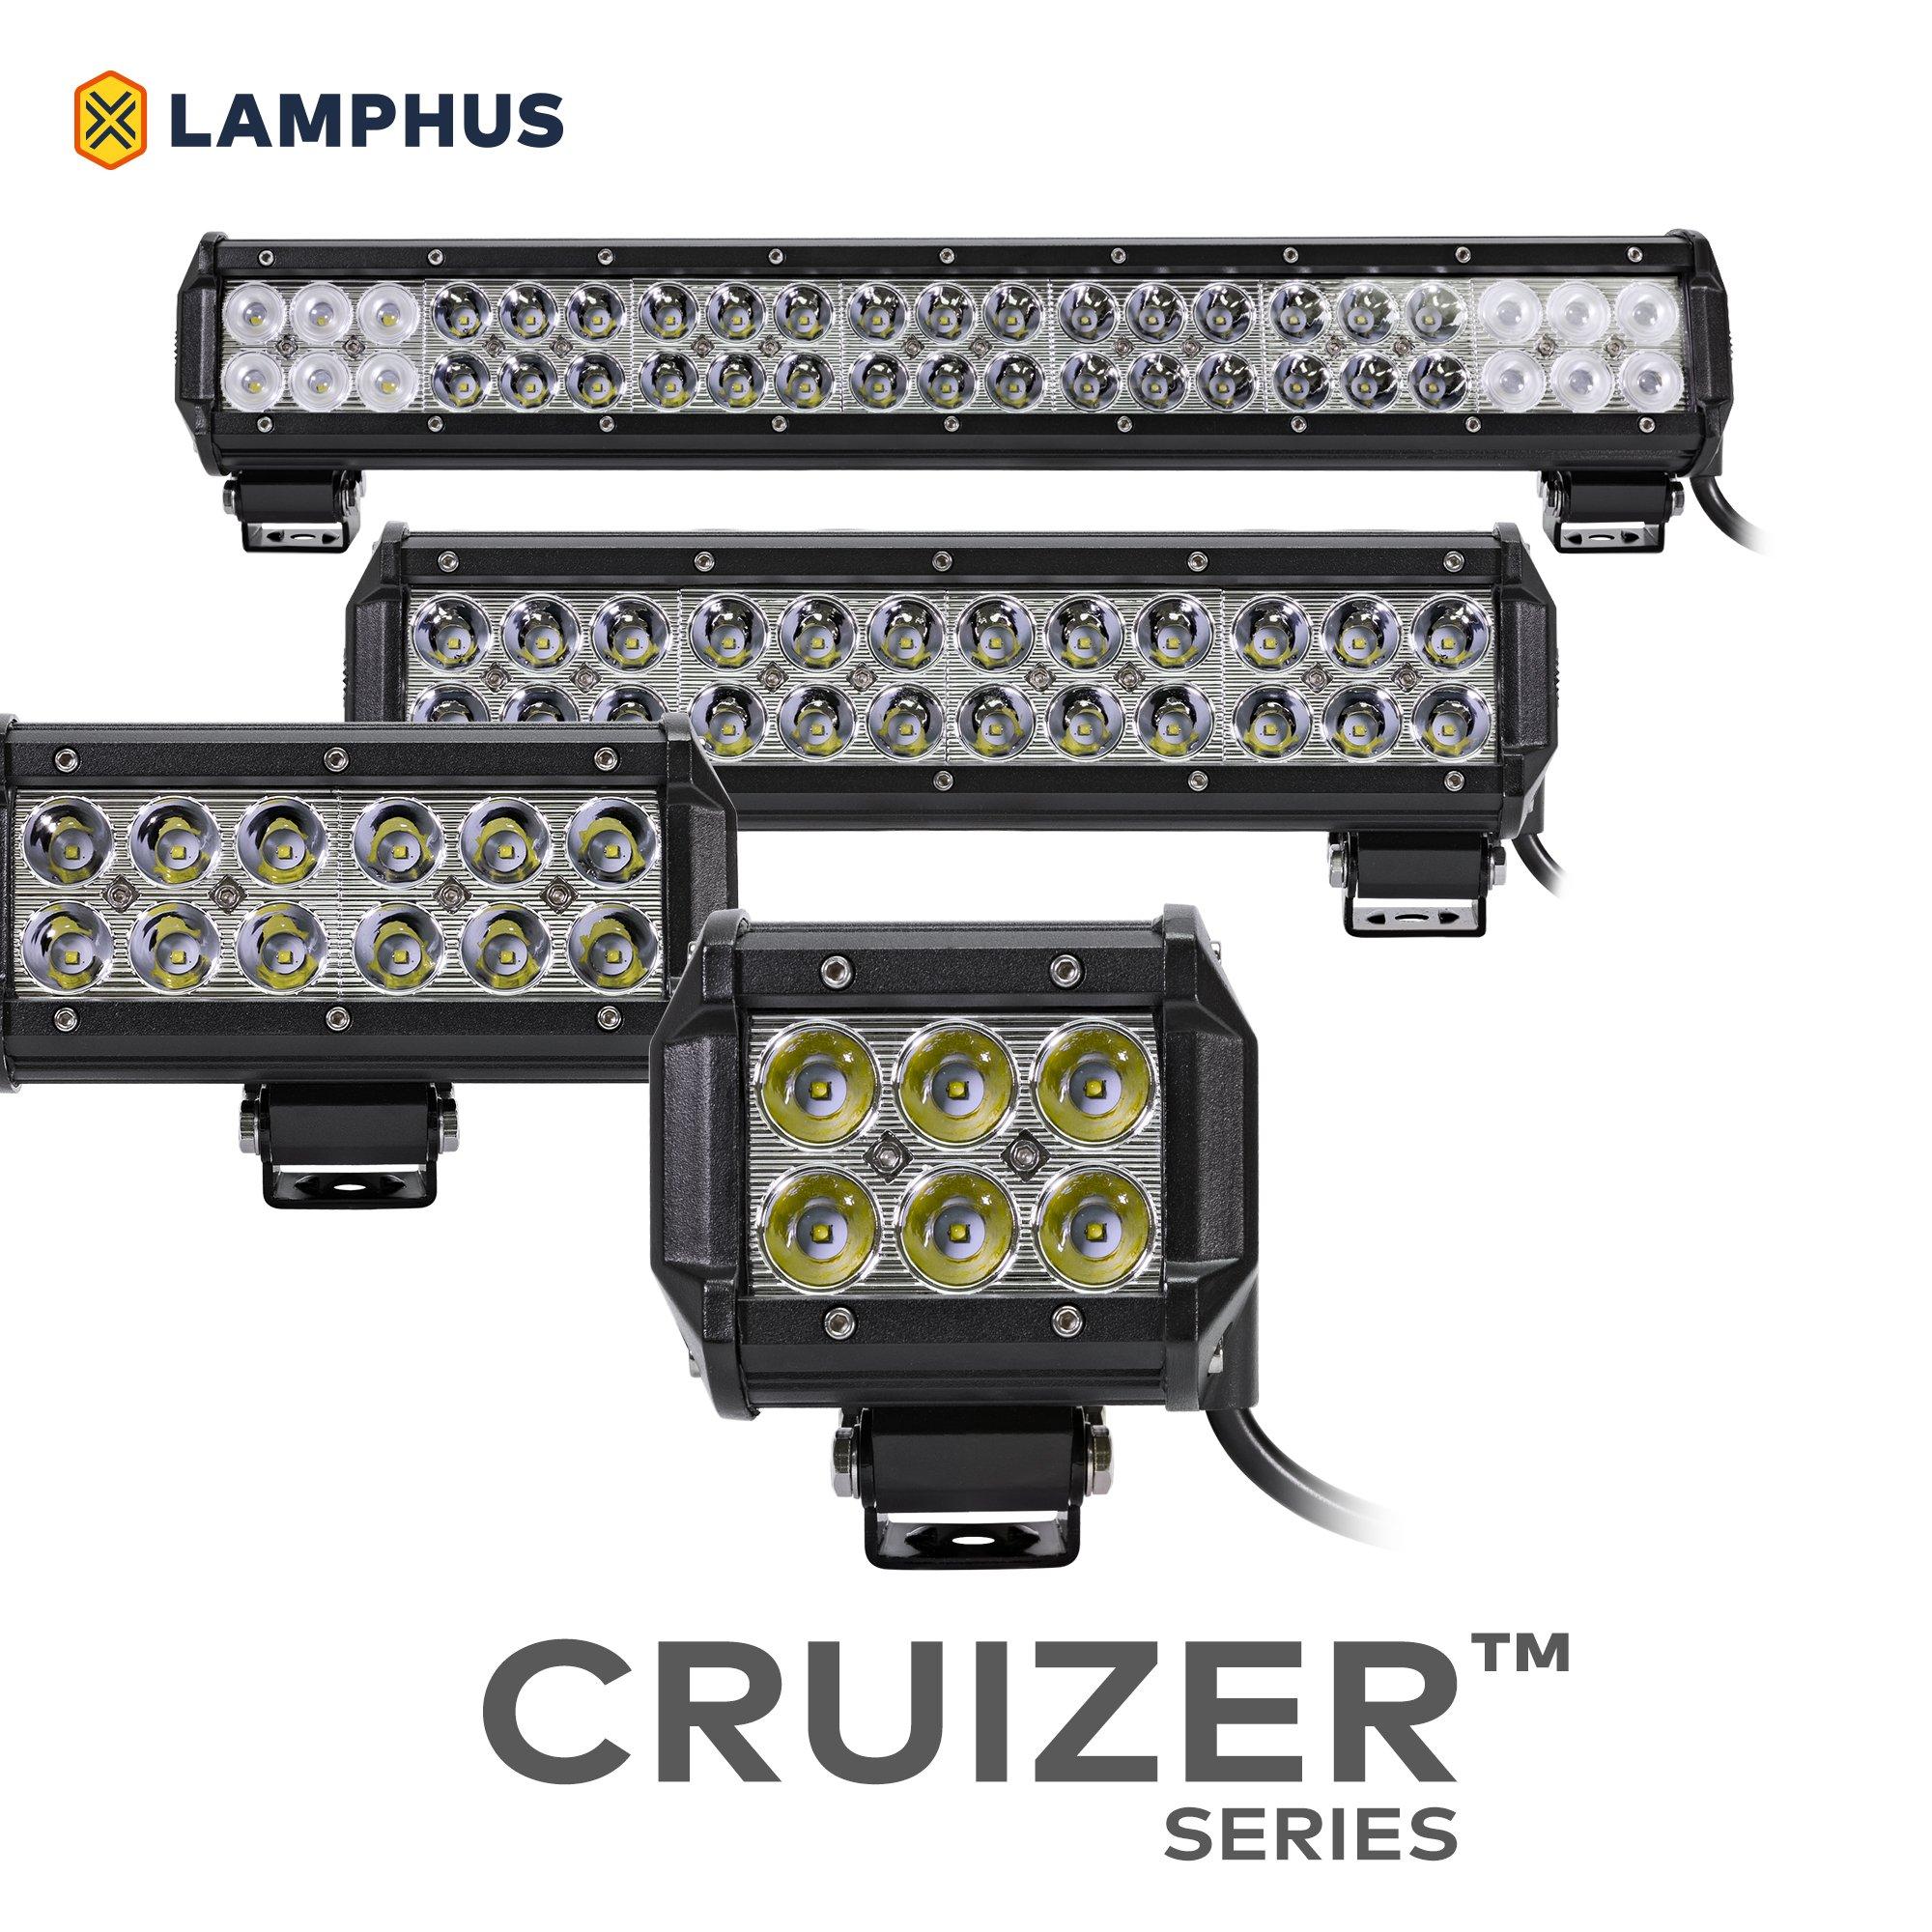 Light Shop Harrow Road: LAMPHUS CRUIZER Light Bar